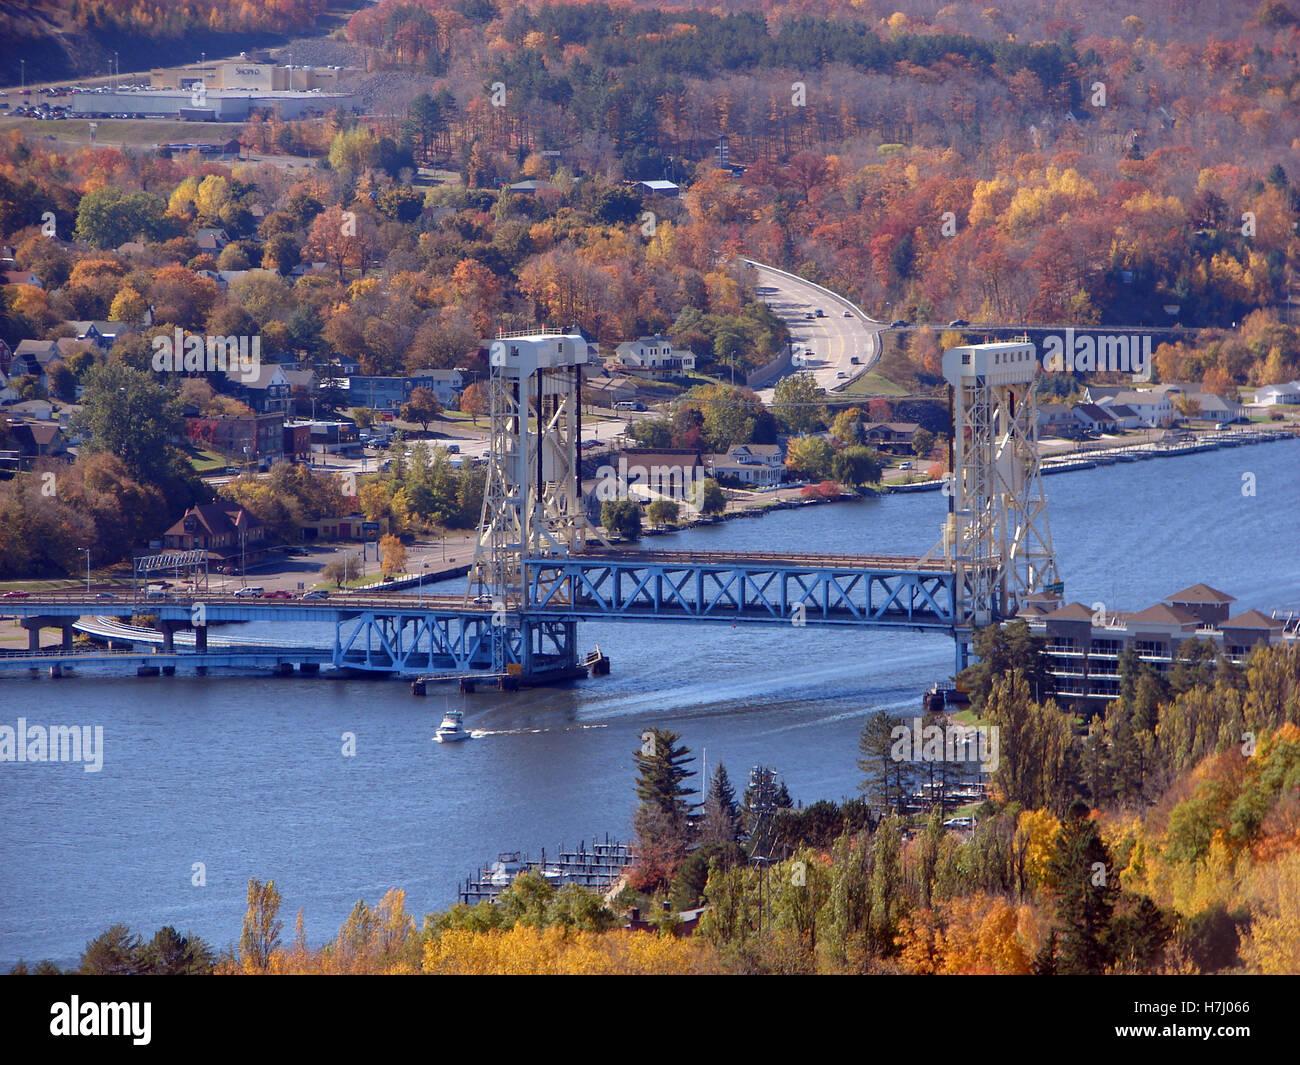 Portage Double Lift Bridge over Portage Lake - Stock Image